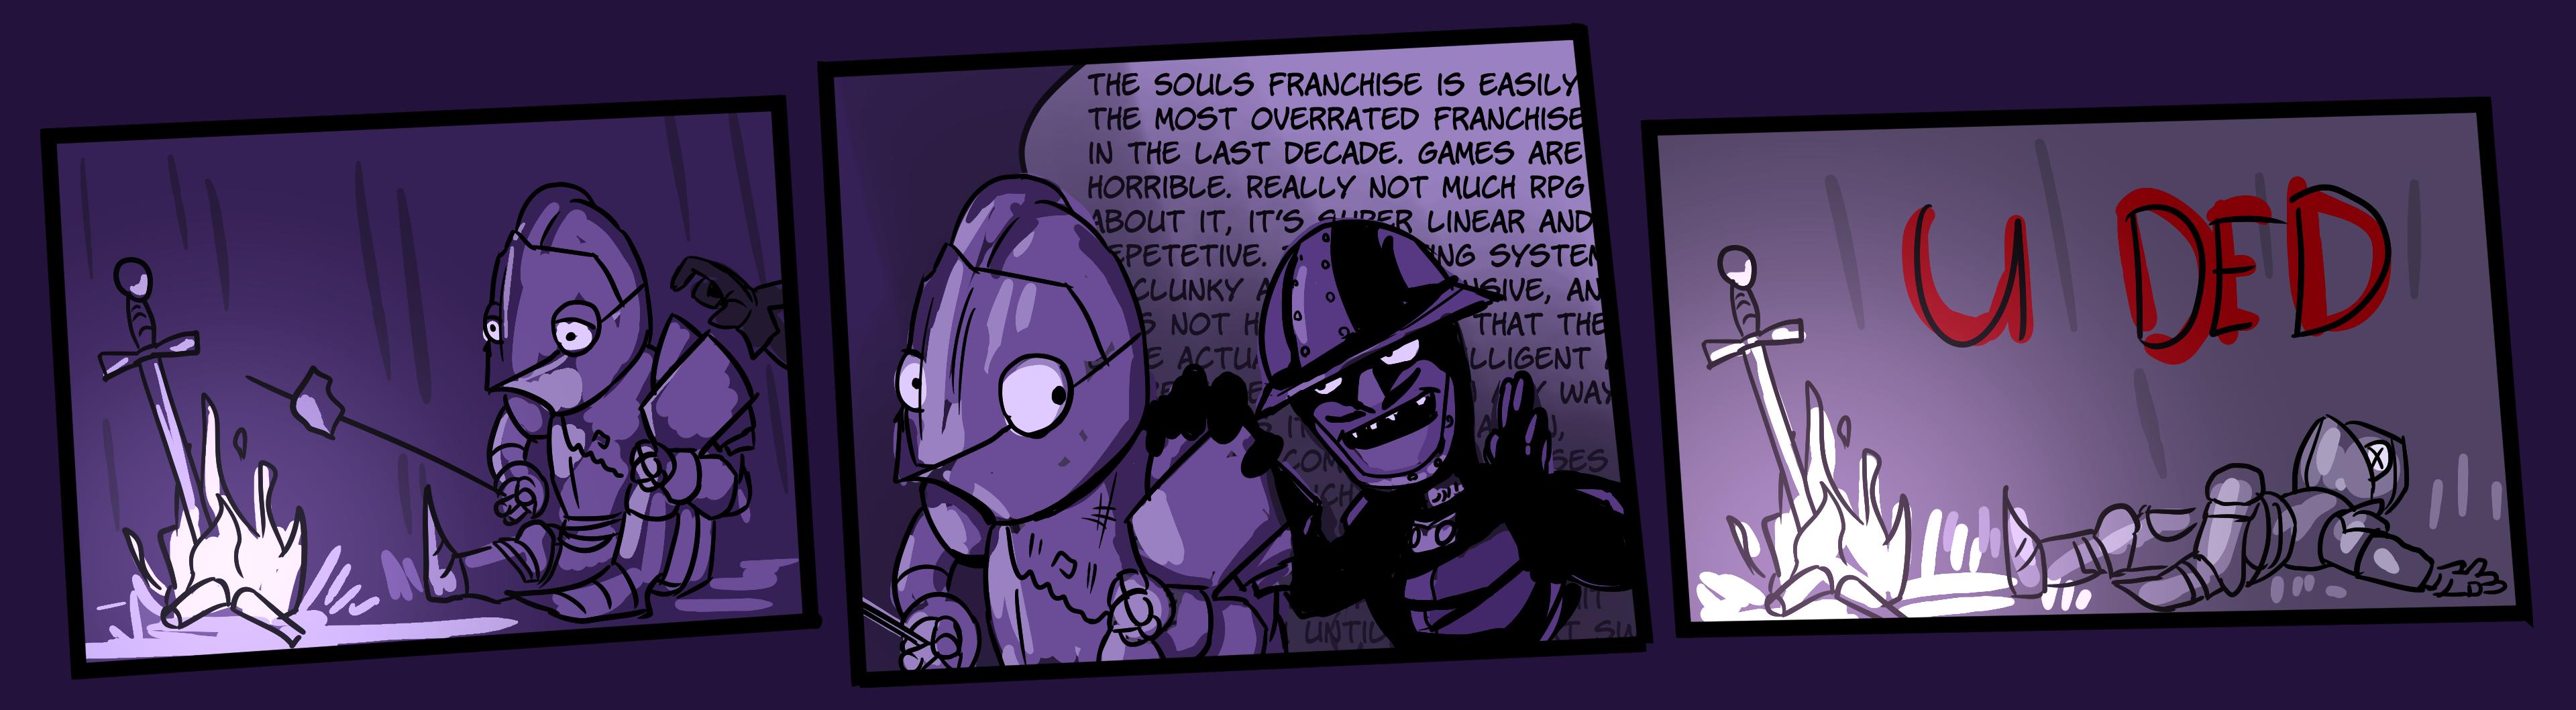 souls franchise.png